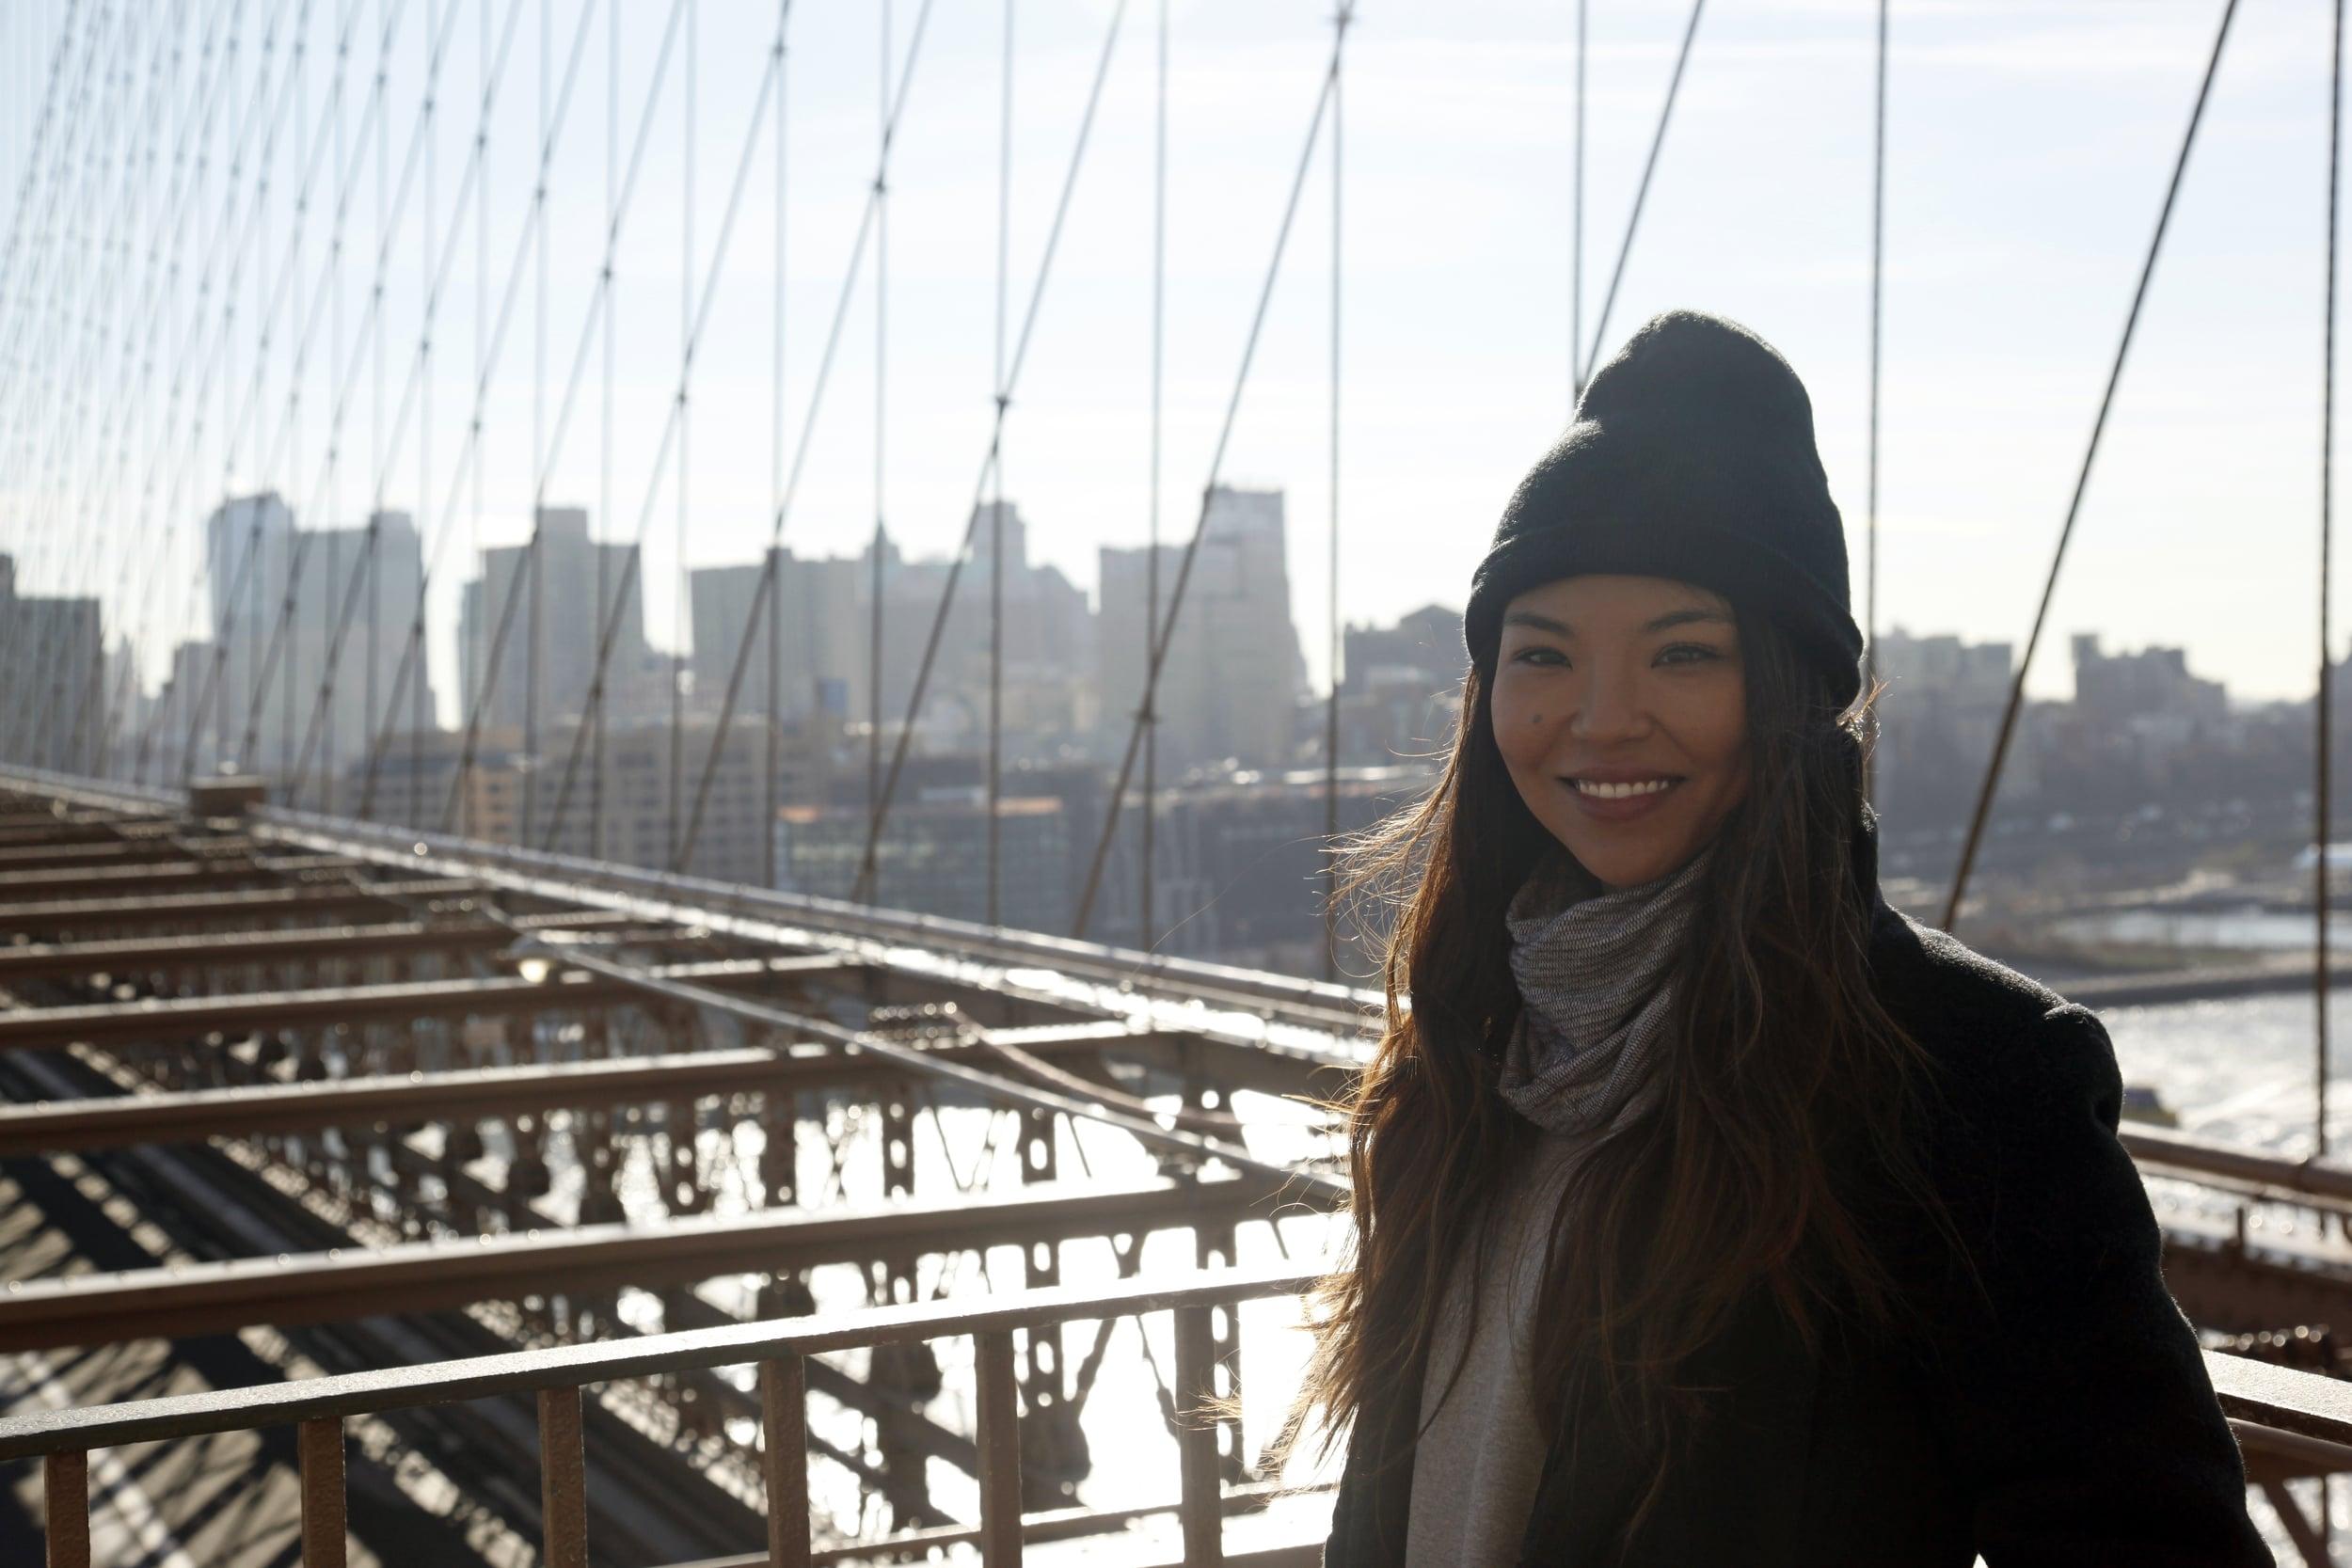 Brooklyn Bridge, New York City, New York, January 2016.